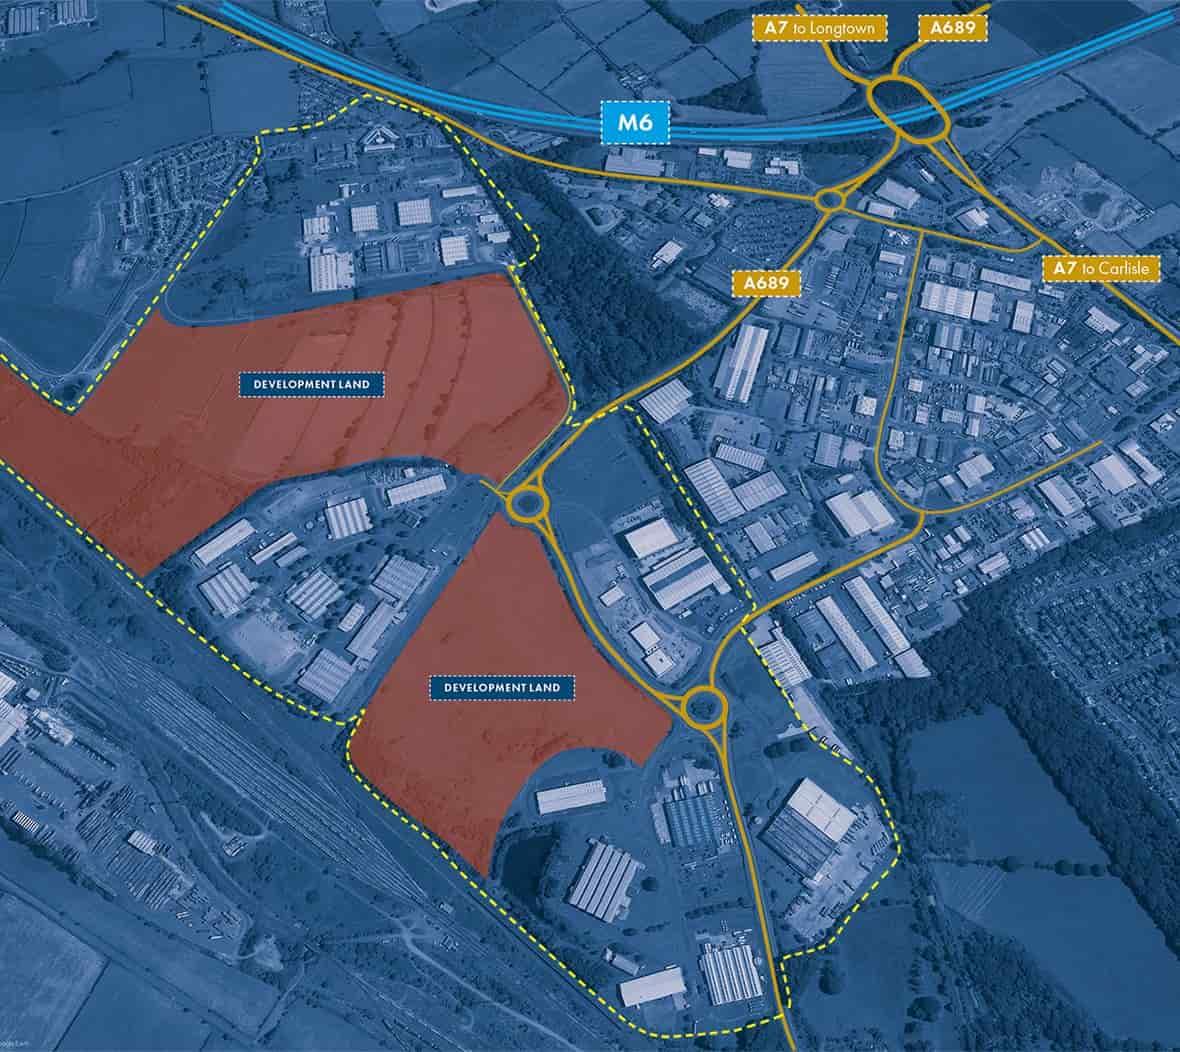 Development space in Carlisle